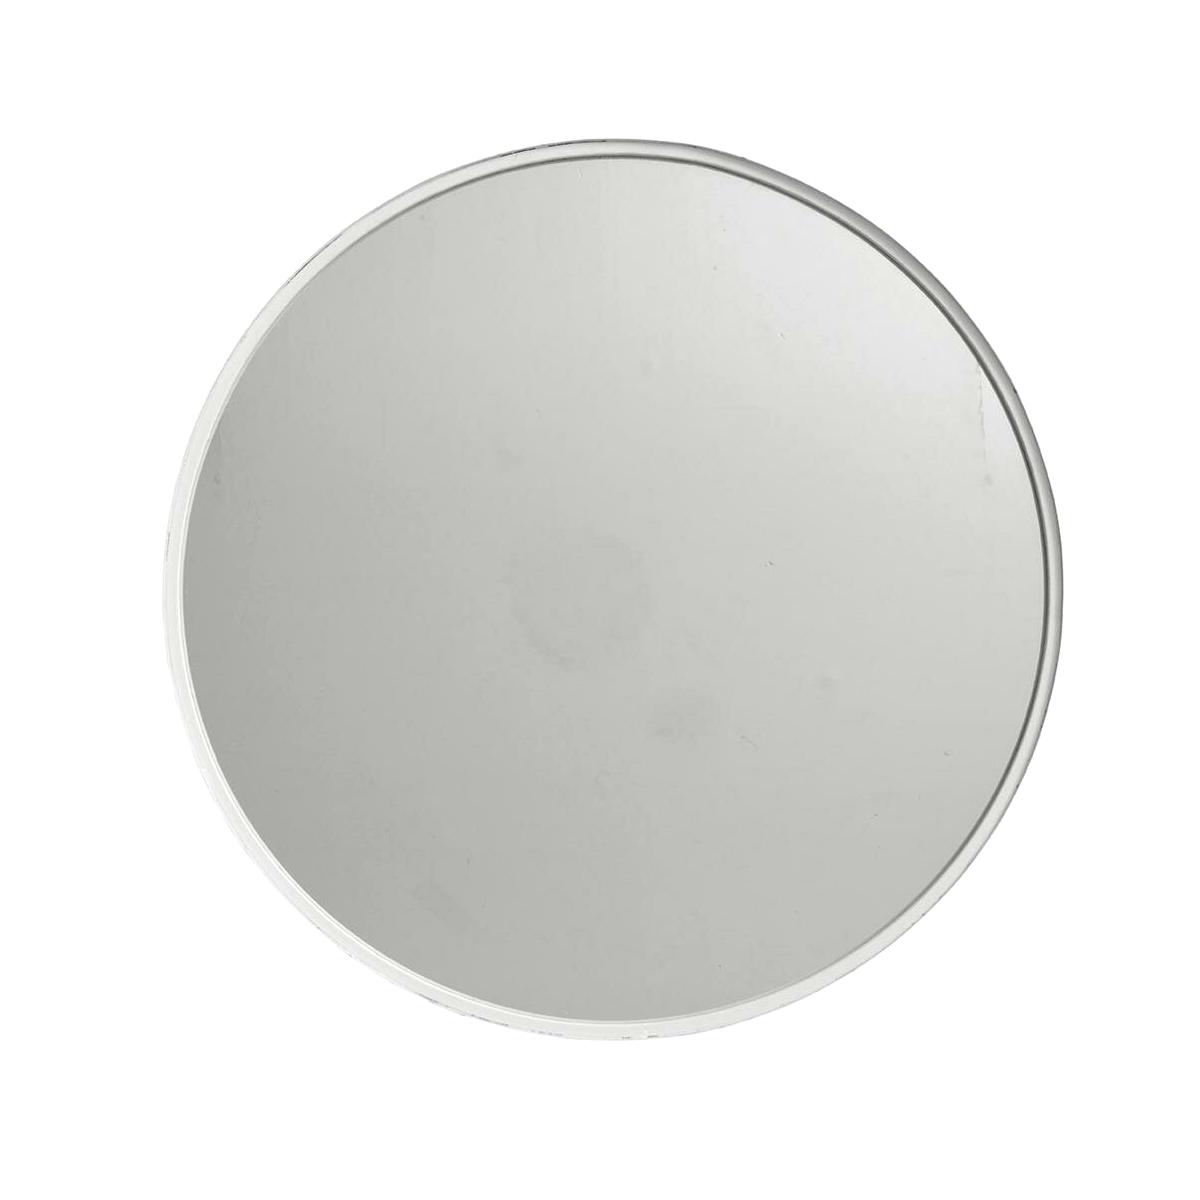 Rund spegel 80 cm vit, Nordal